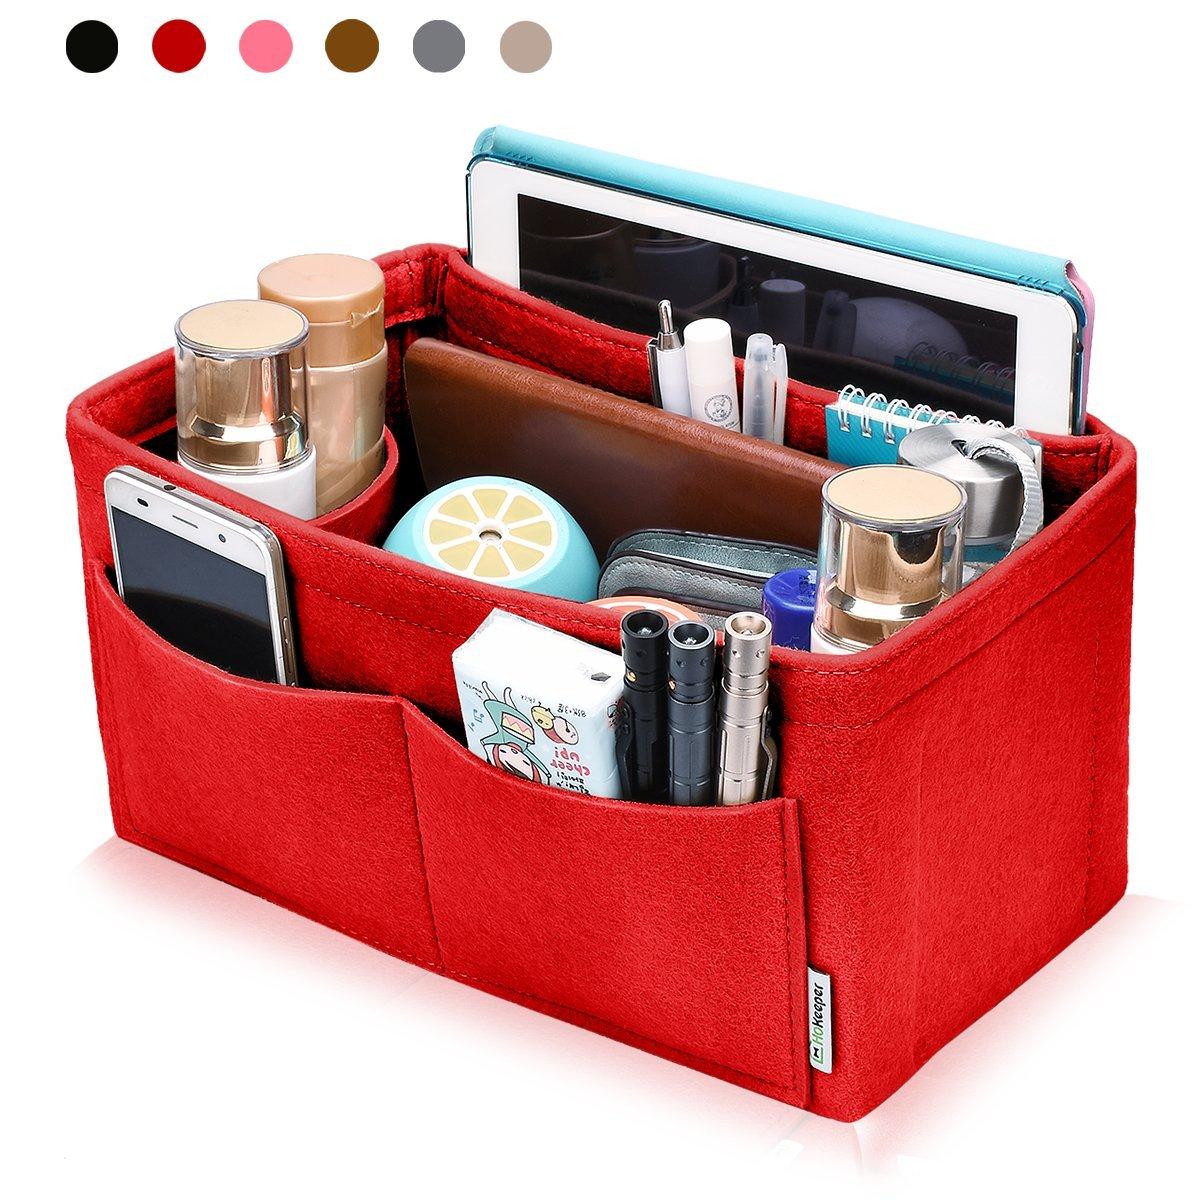 Hokeeper Felt Purse Insert Multi-pocket Organizer, Handbag Organizer, Bag in Bag, 11 Compartments, 4 Sizes, 6 Colors by Hokeeper